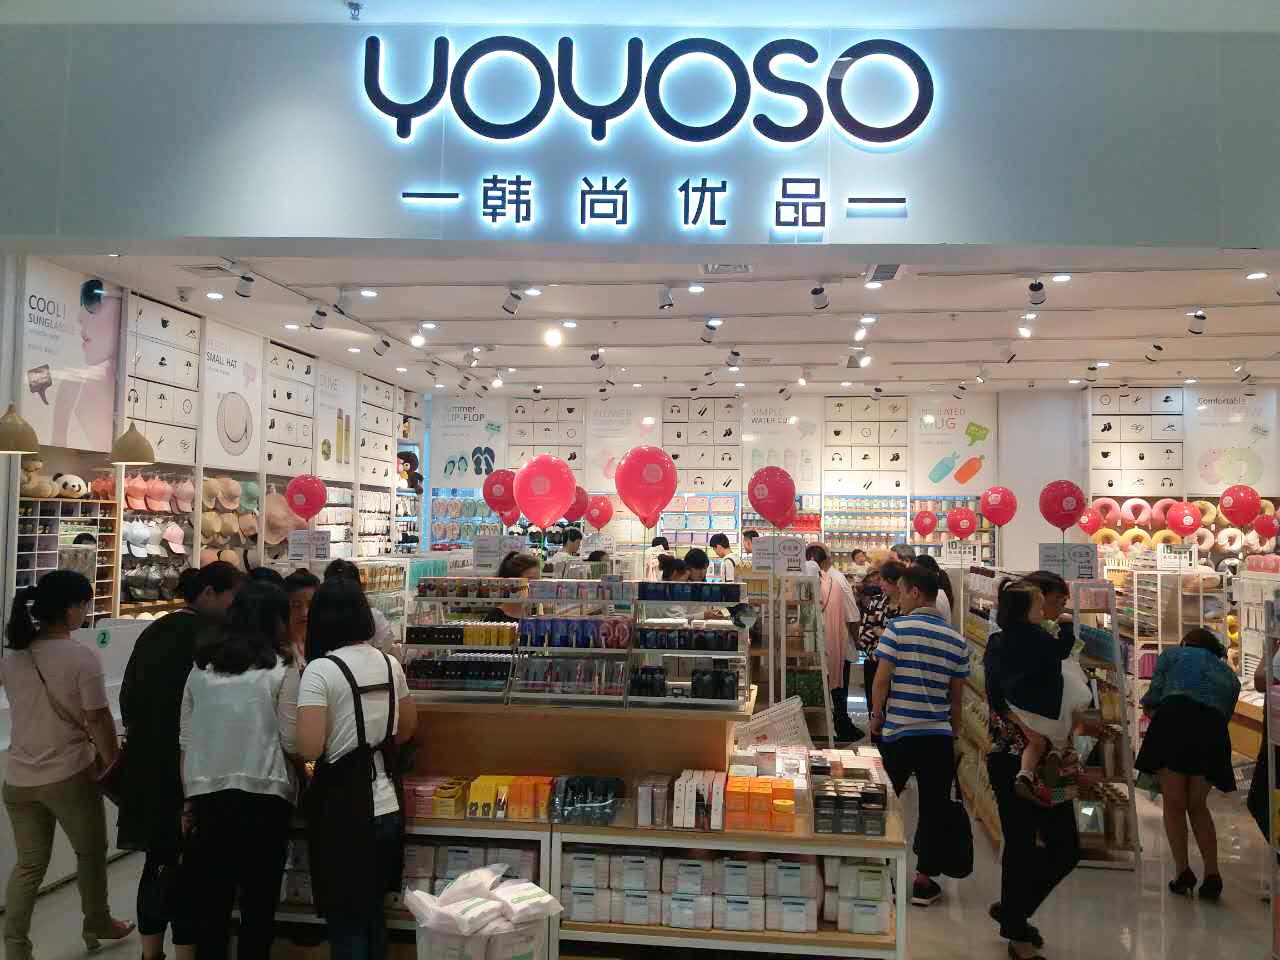 YOYOSO商学院:电商冲击下的逆袭之道